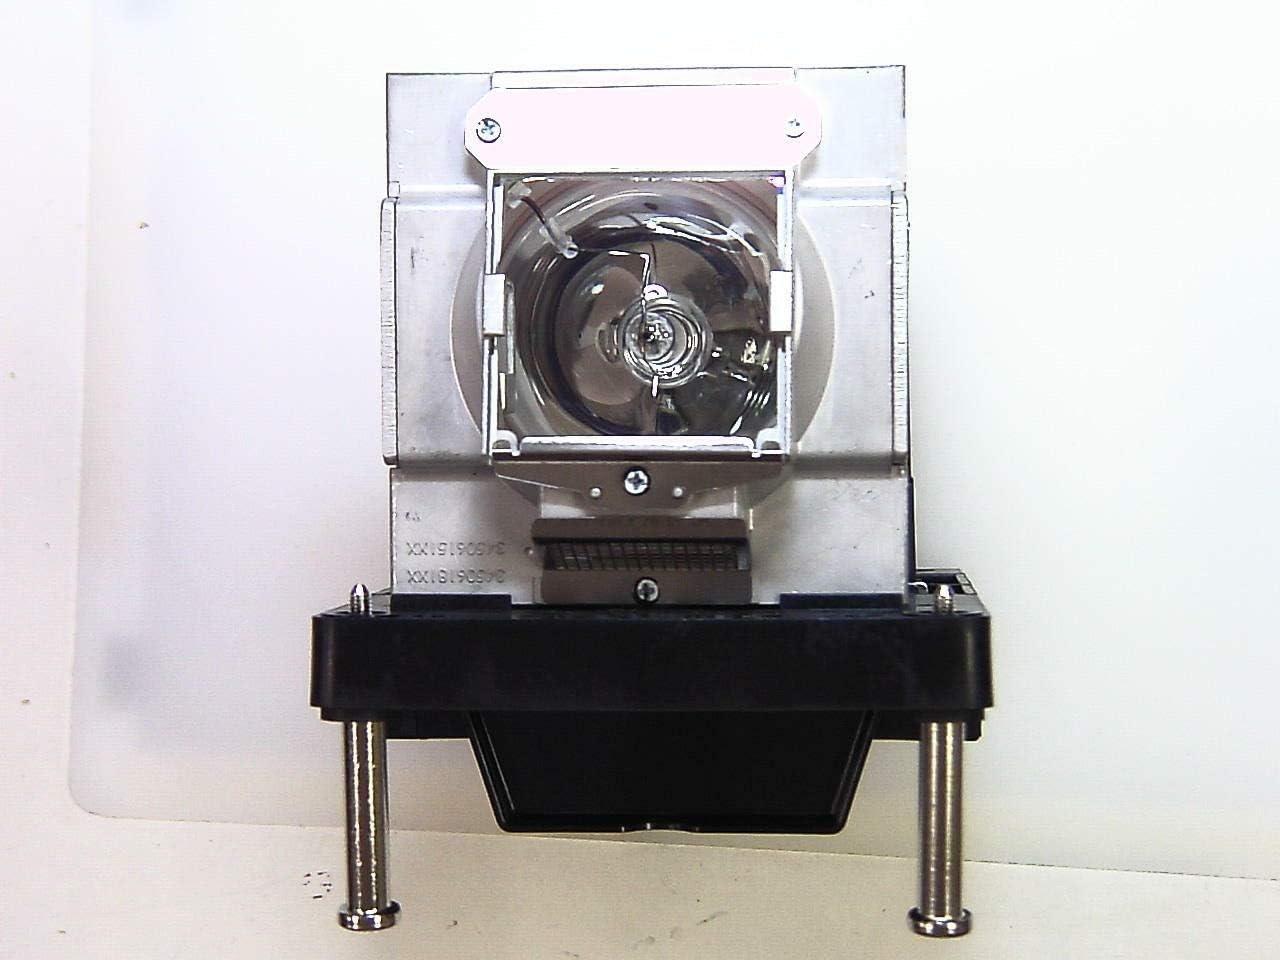 Barco RLM W14 Projector Housing with Genuine Original OEM Bulb